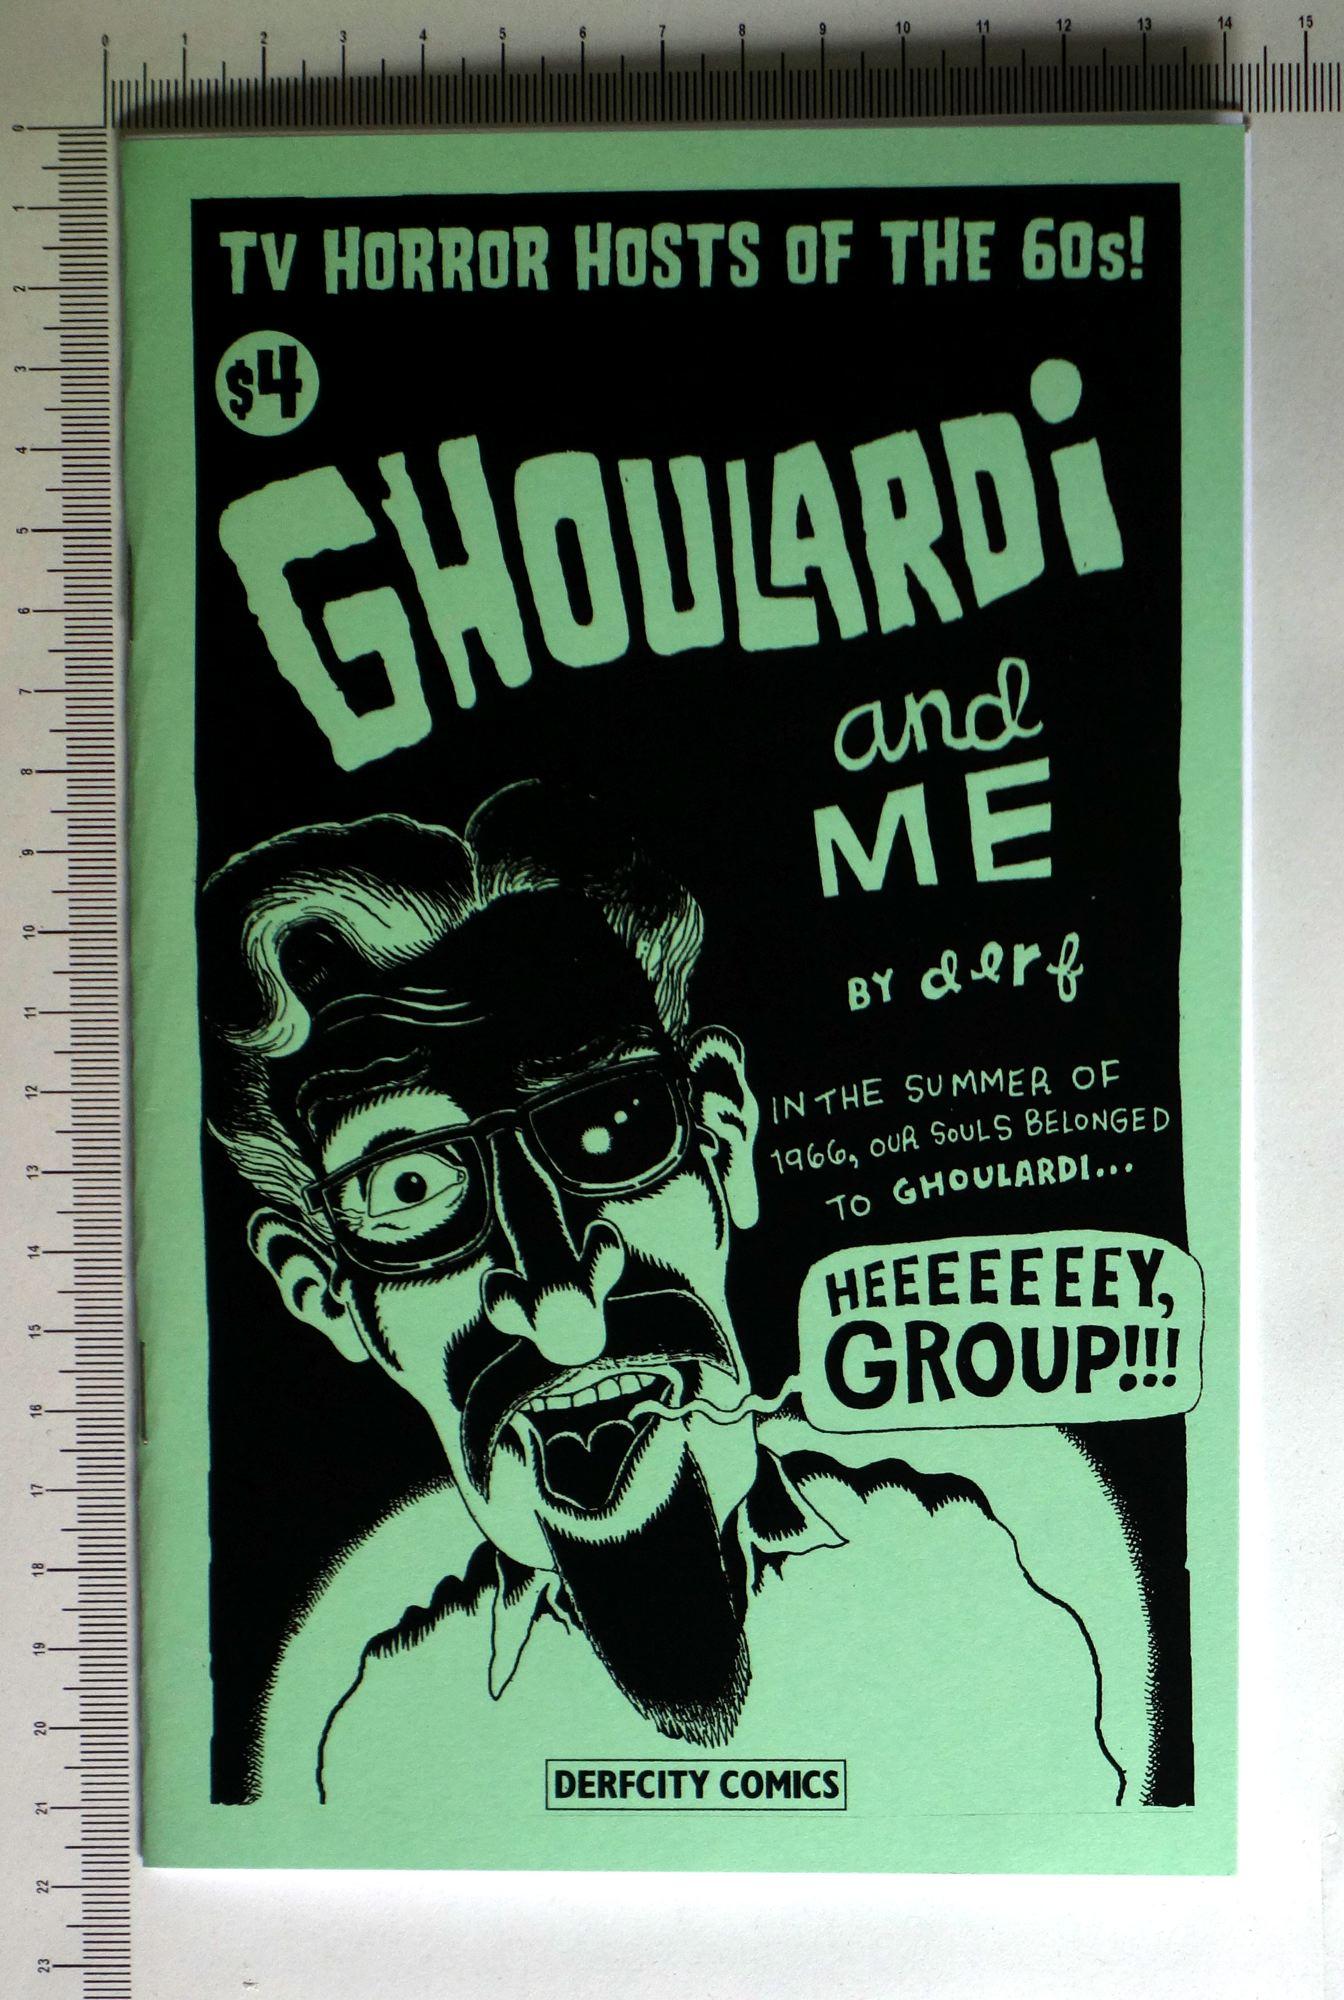 Ghoulardi and me, fanzine